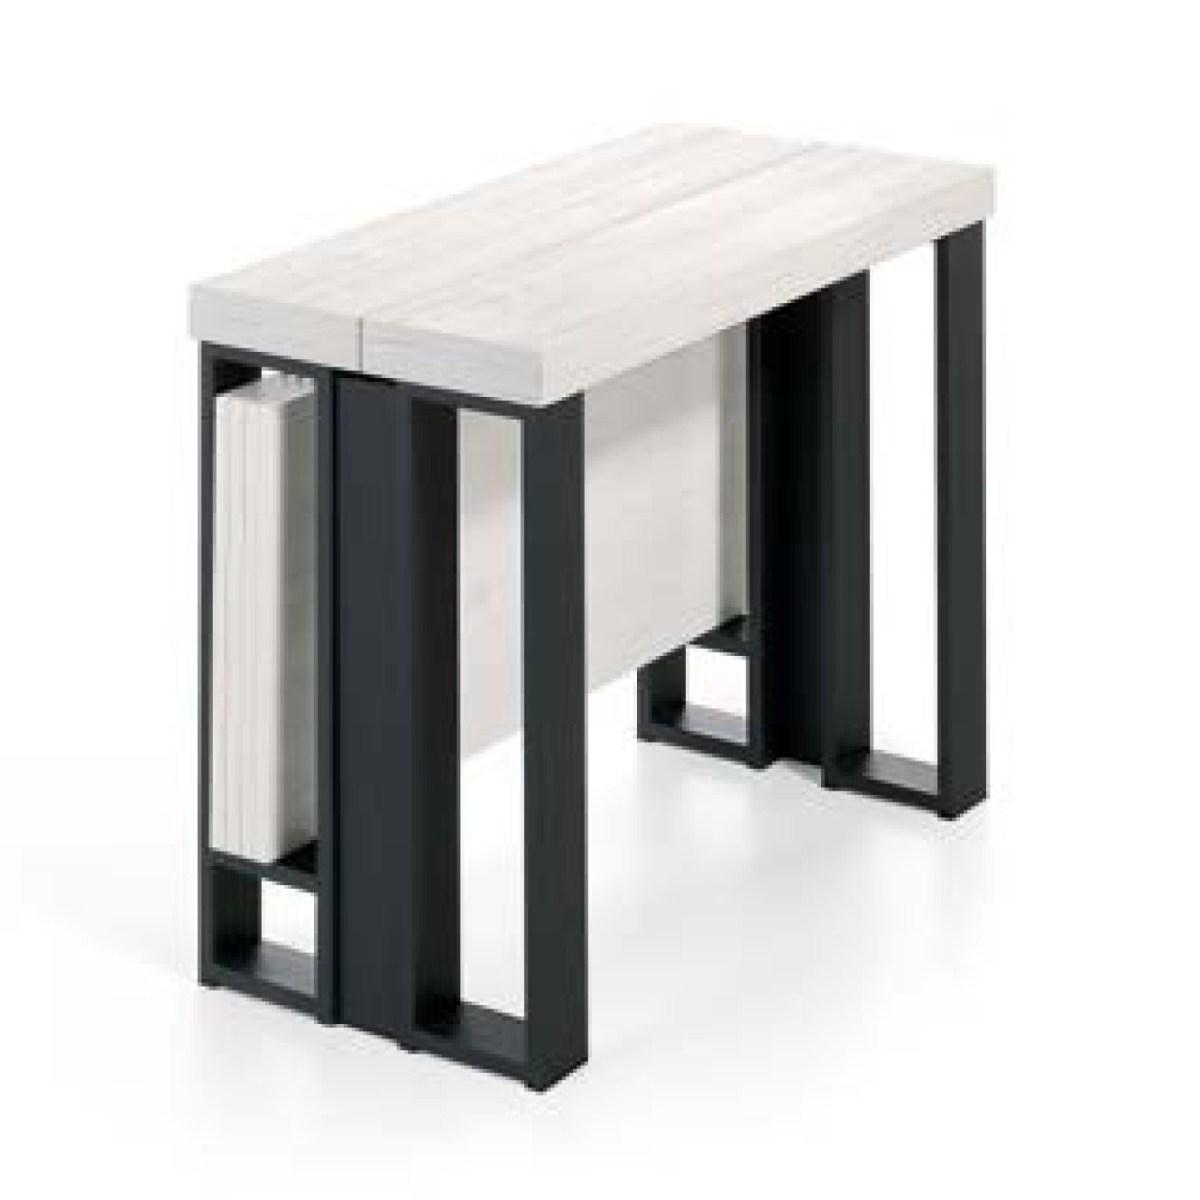 Consola extensible a mesa de comedor